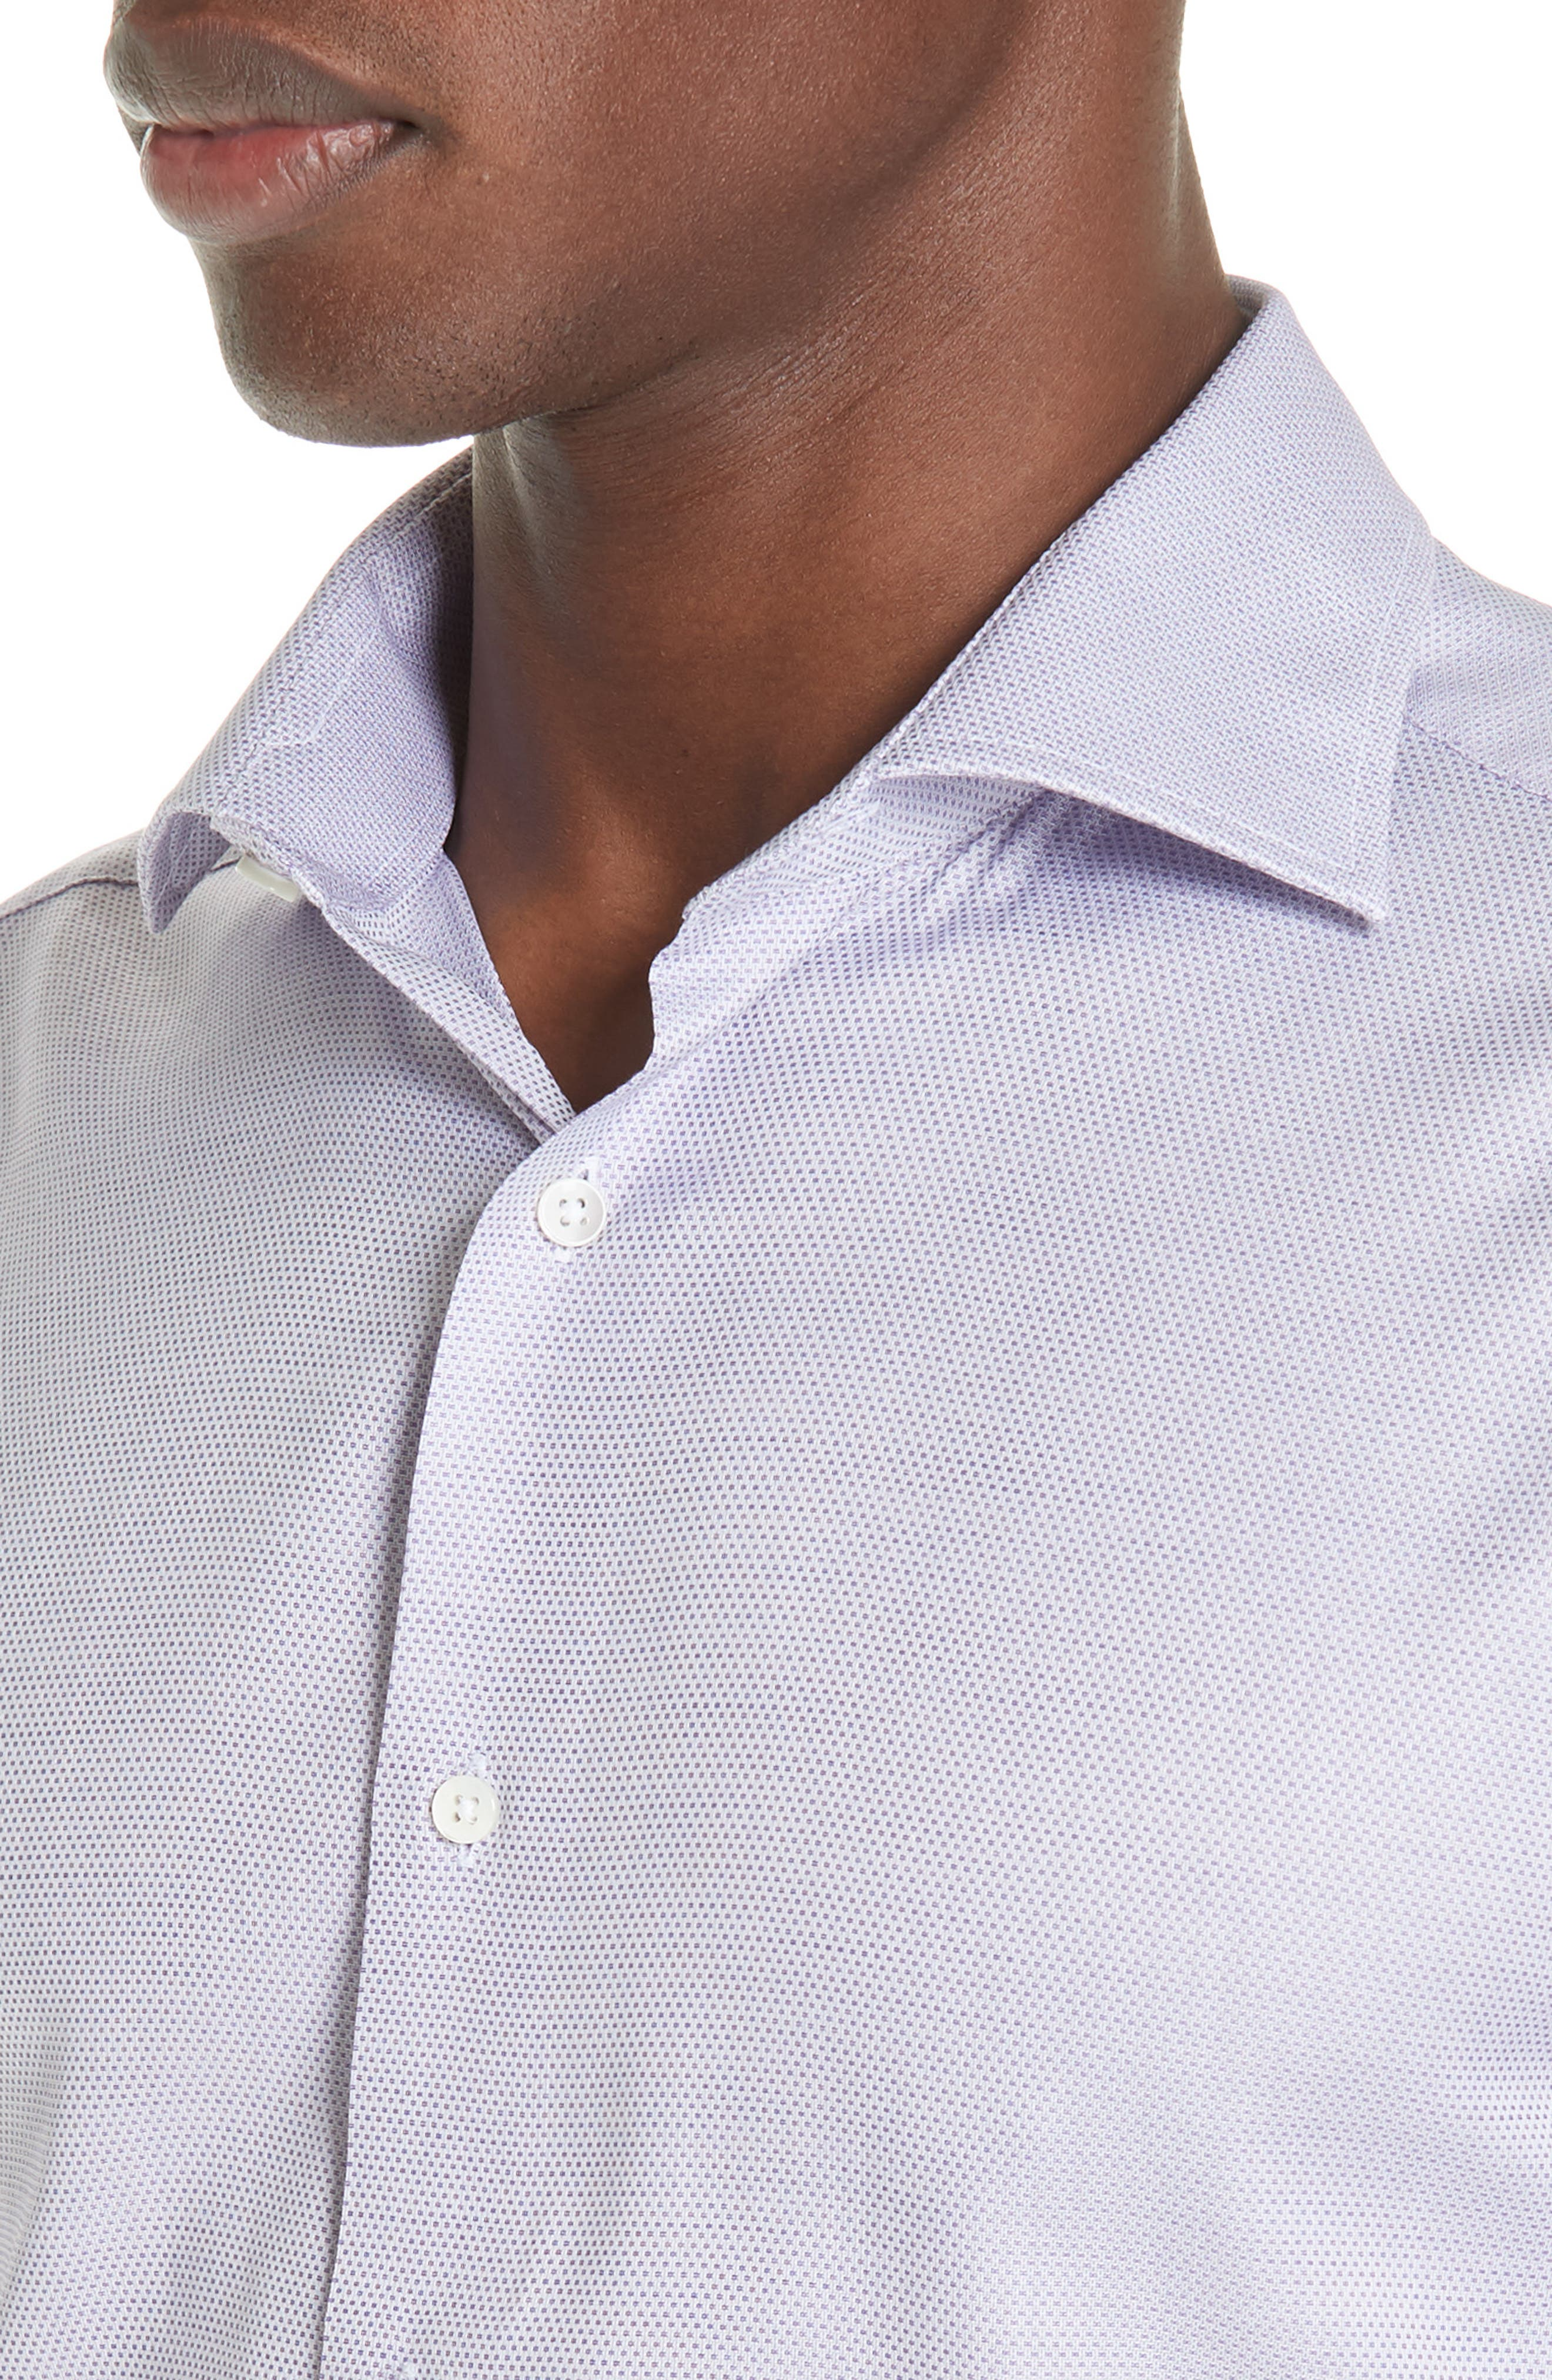 Trim Fit Dress Shirt,                             Alternate thumbnail 2, color,                             LIGHT PURPLE